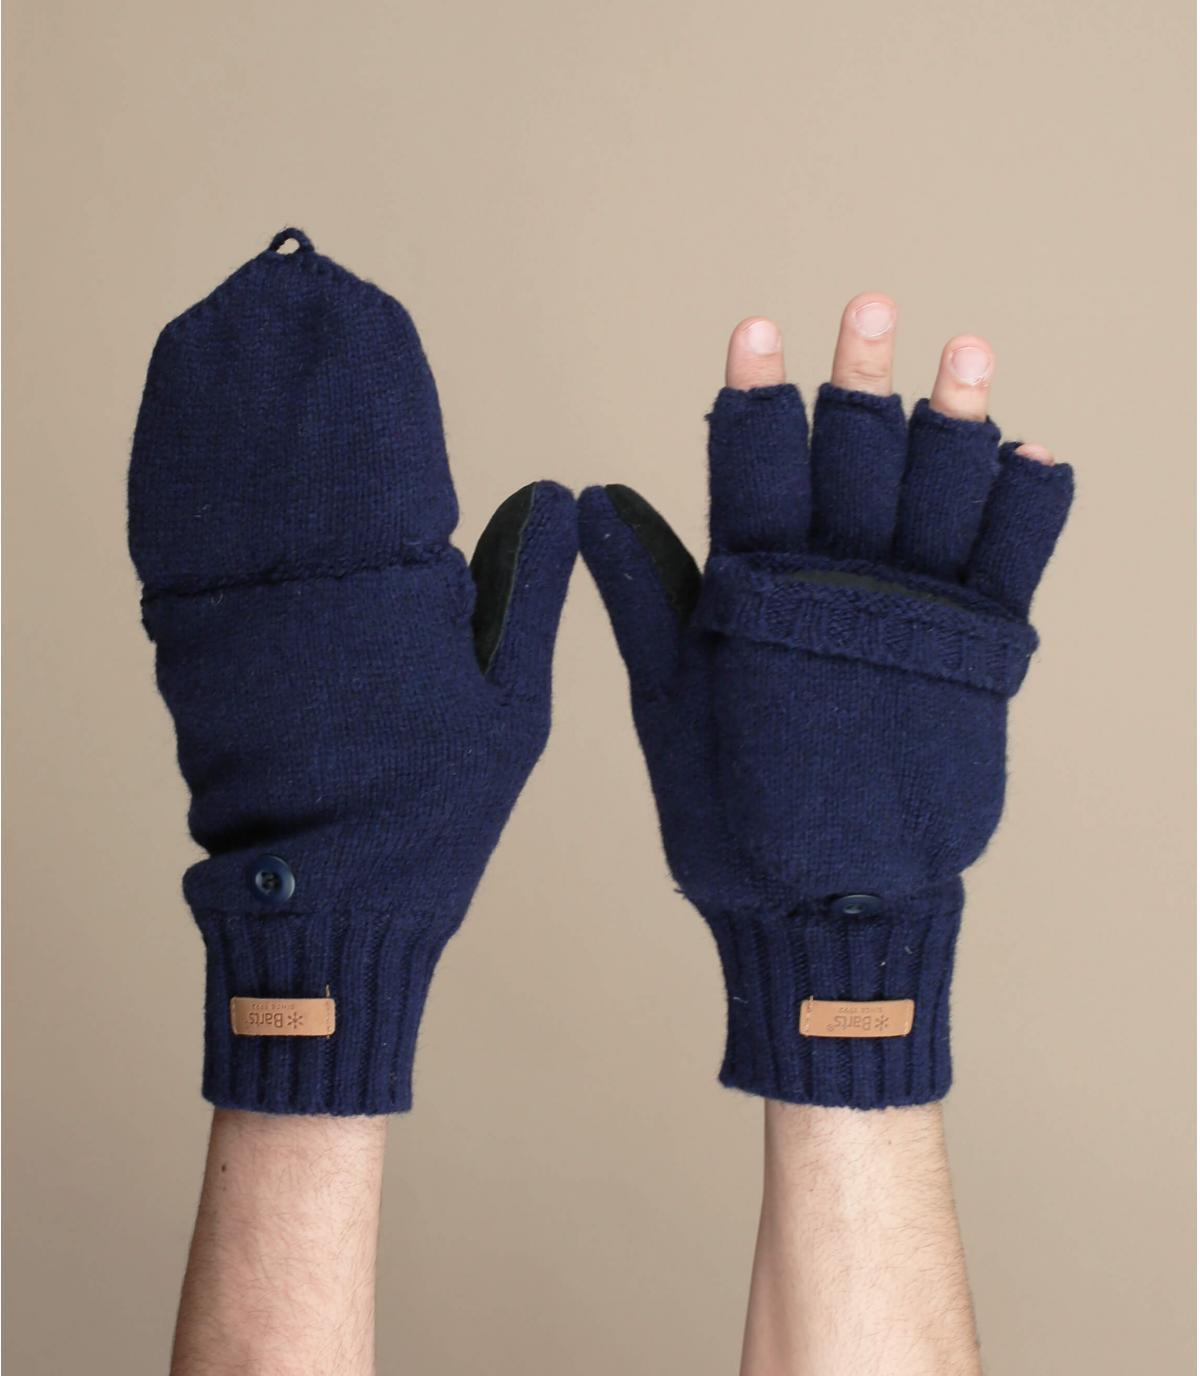 Blaue Fäustlinge Handschuhe